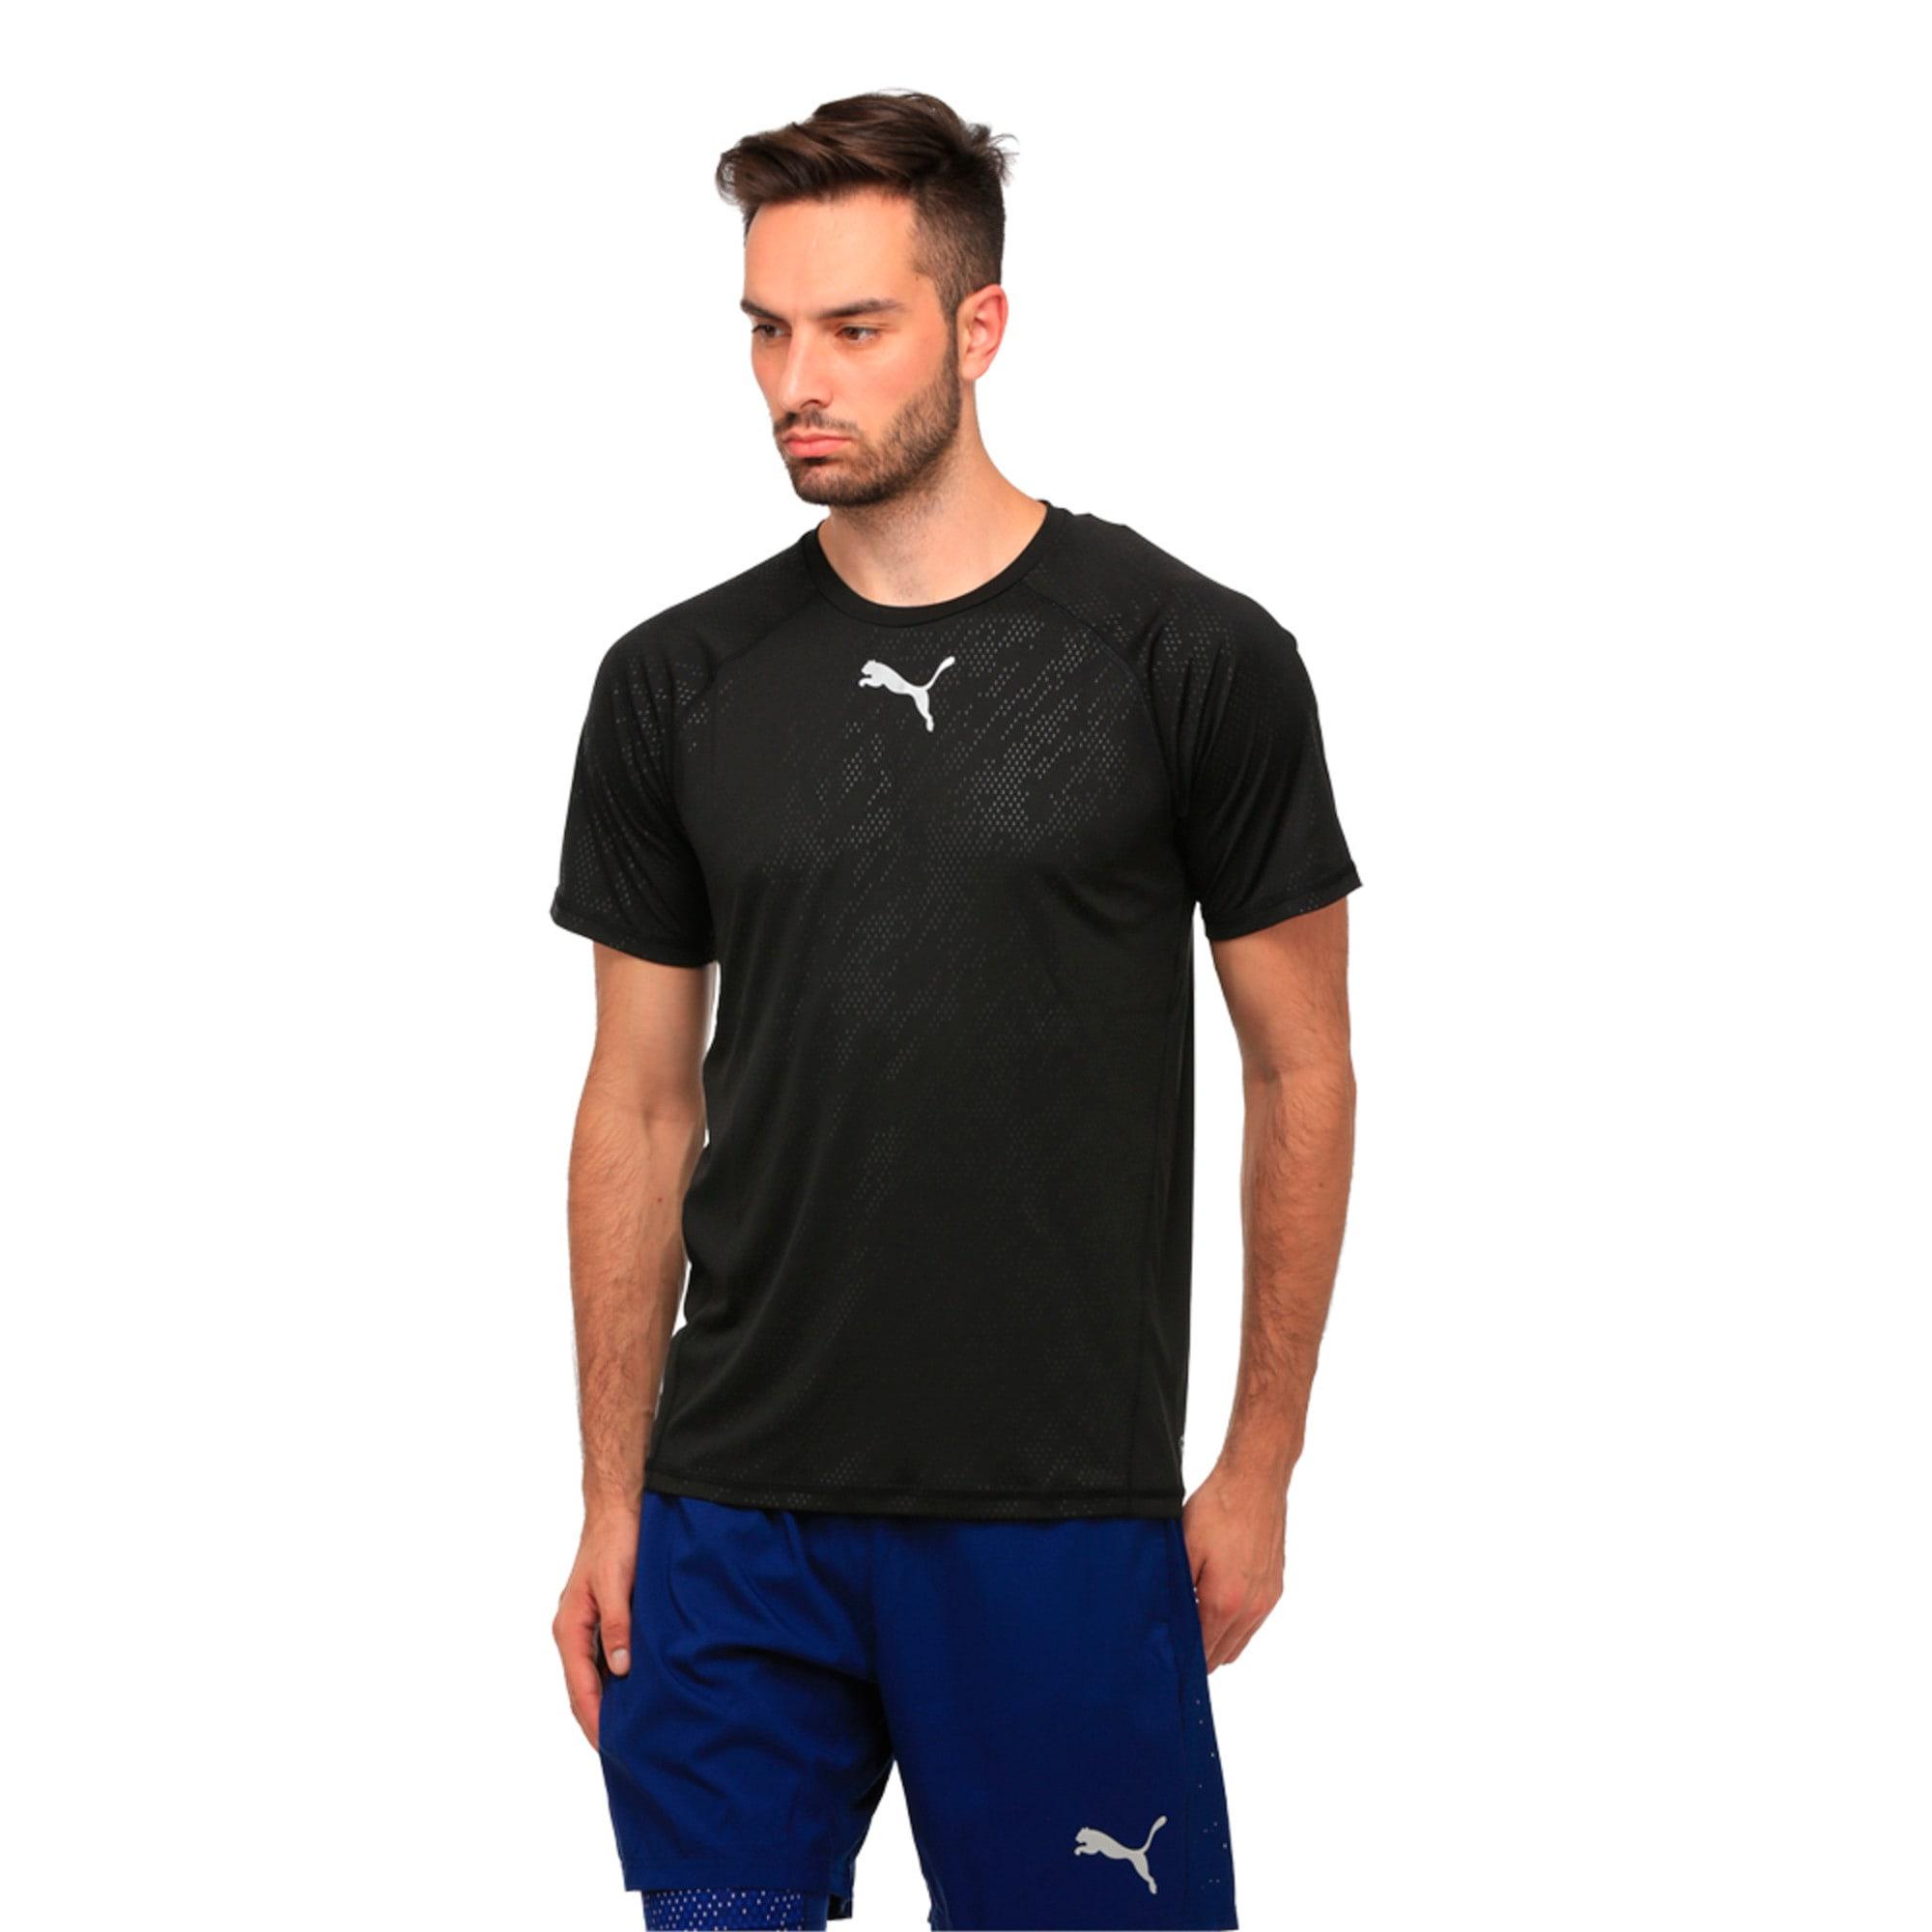 Thumbnail 1 of Active Training Men's Vent T-Shirt, Puma Black, medium-IND